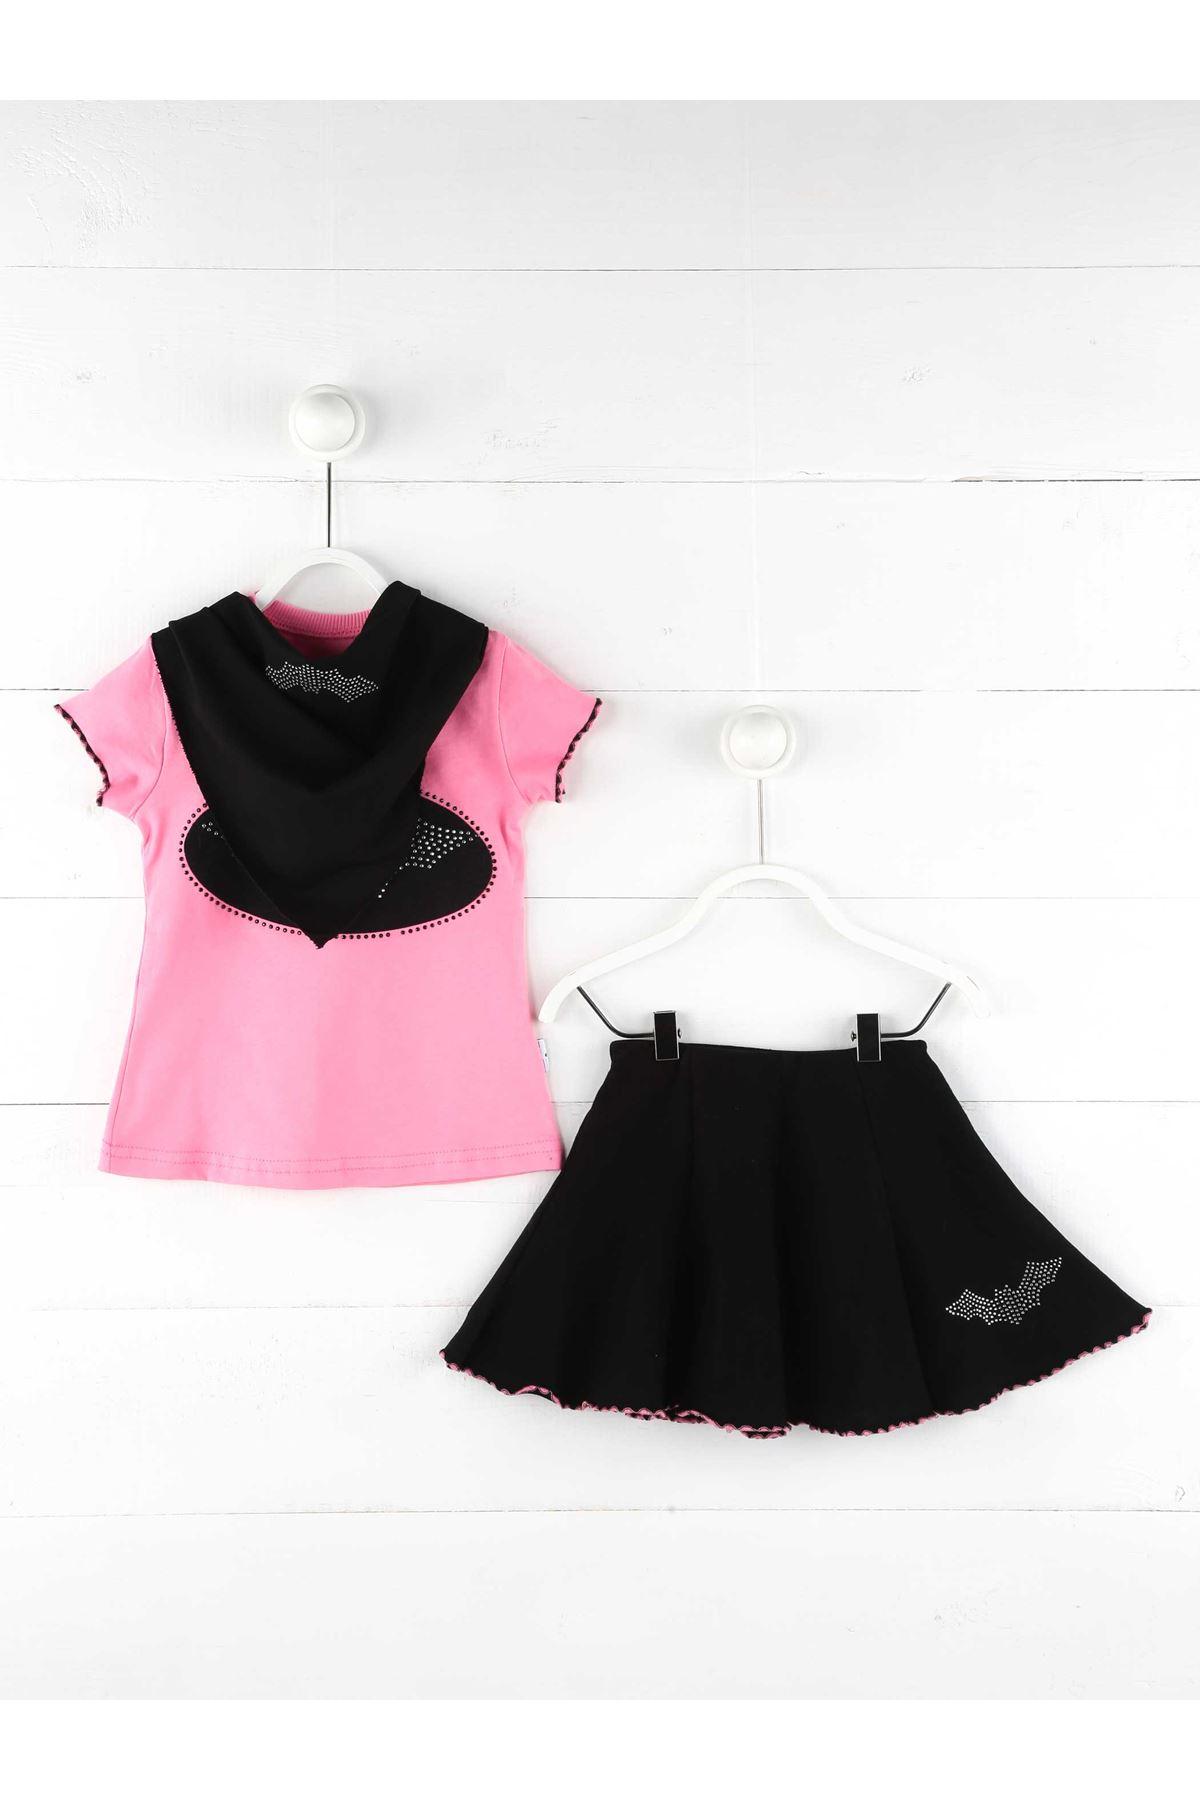 Girls skirt T-shirt 2 Sets Casual Model Stylish Girls Kids Cotton Clothing Sets pink Black suit cute clothing style